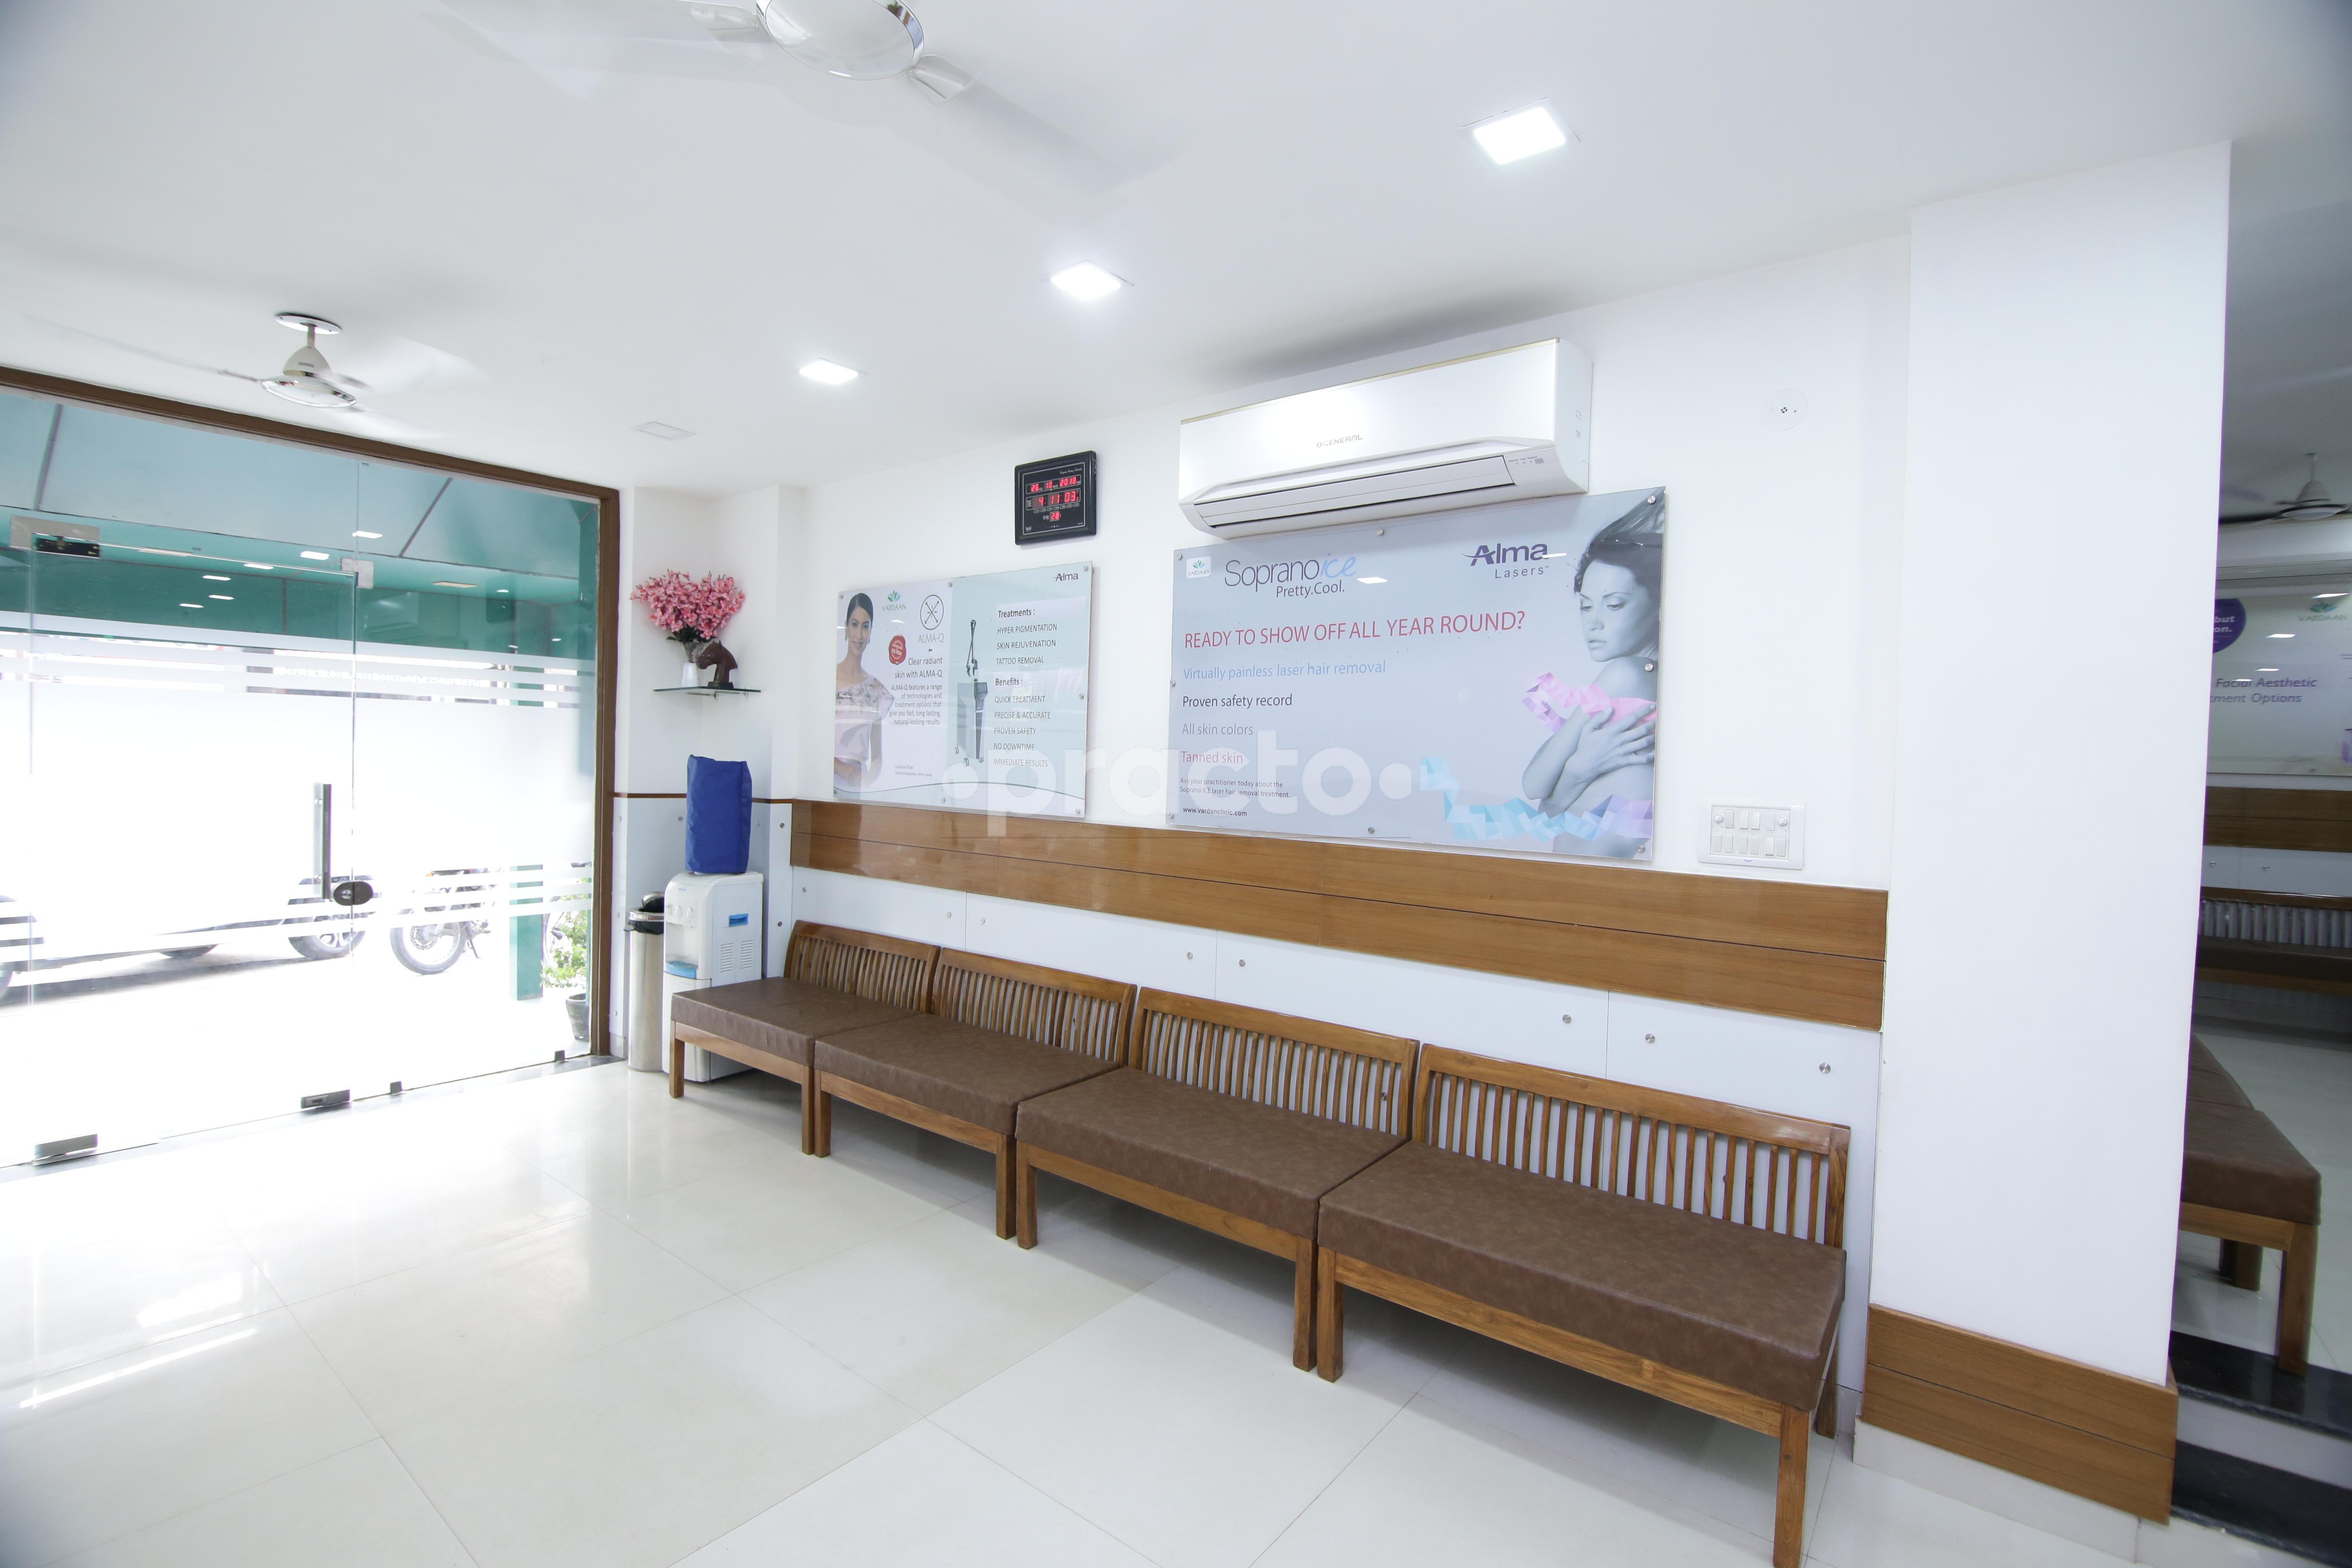 Best Skin Clinics in Rohini, Delhi - Book Appointment, View